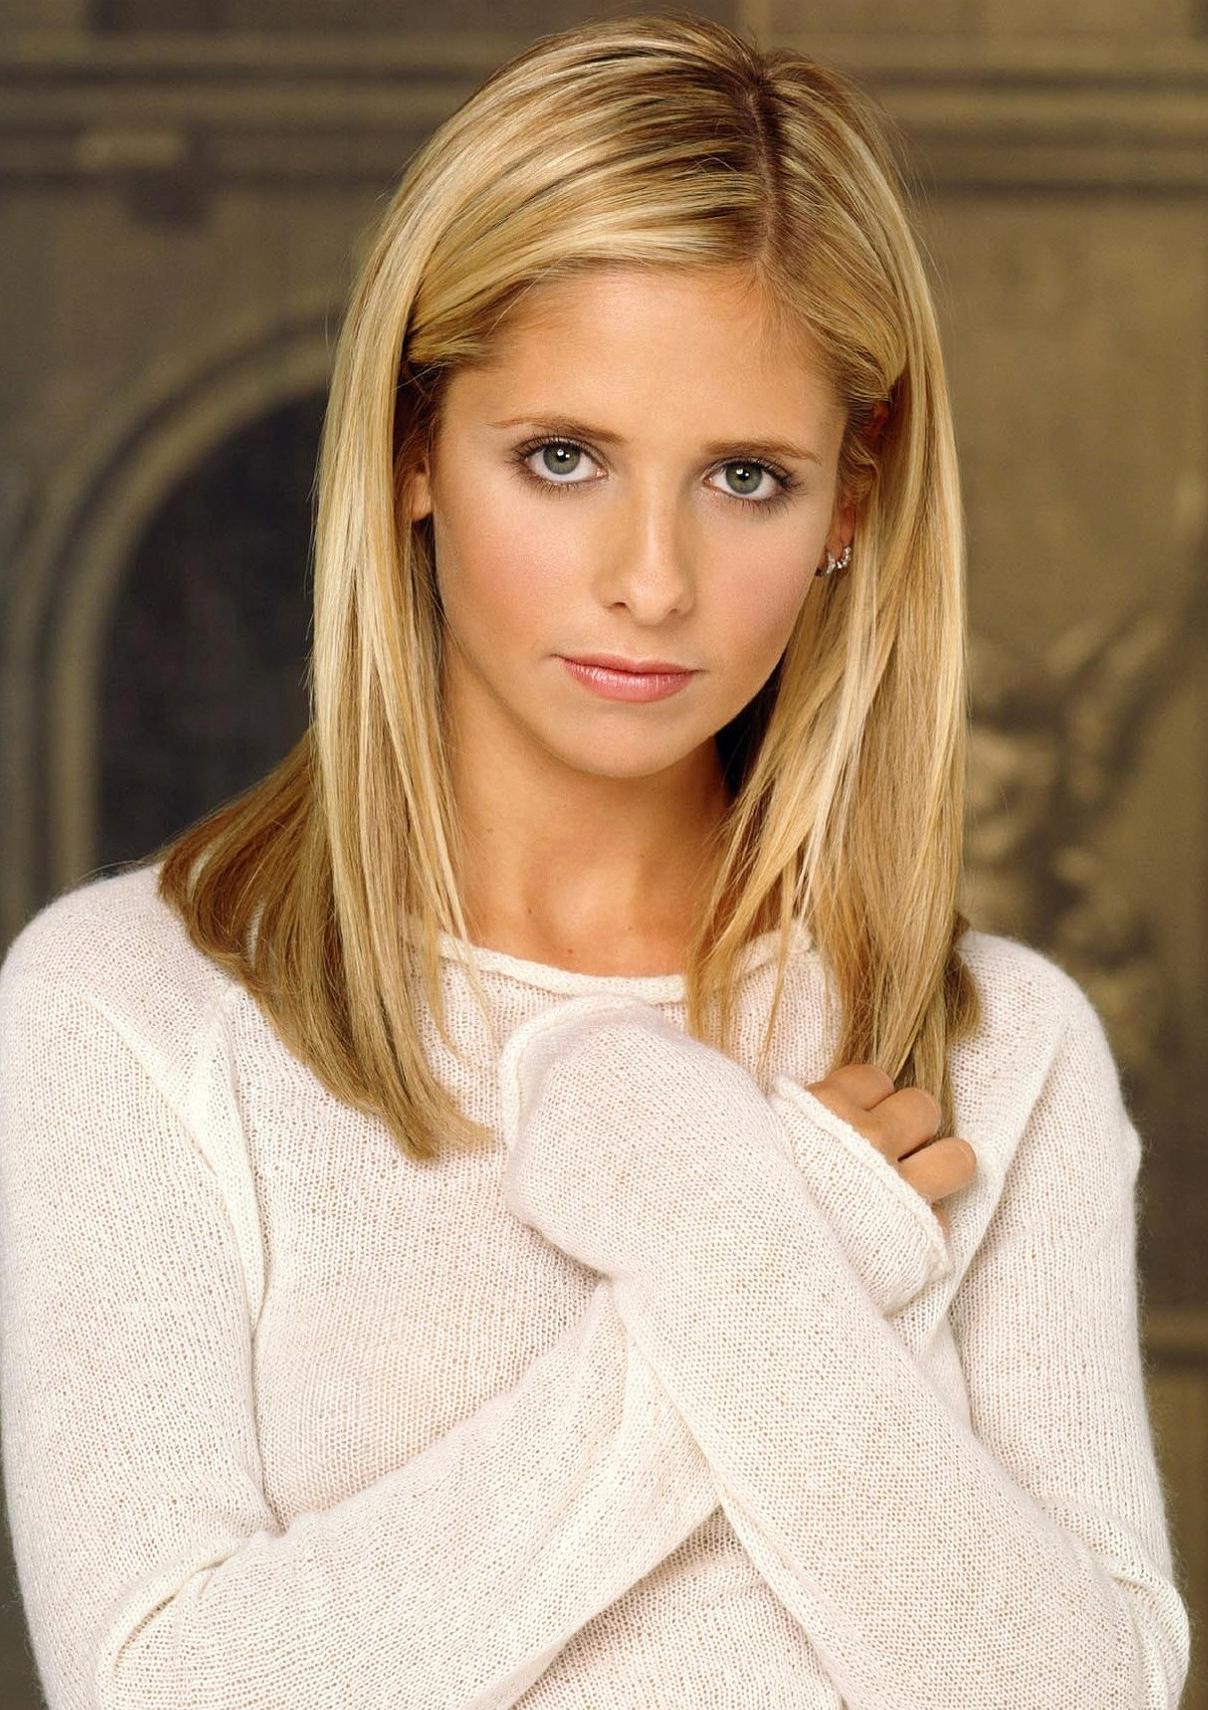 Buffy the Vampire Slayer's Buffy Summers (1997-2003)